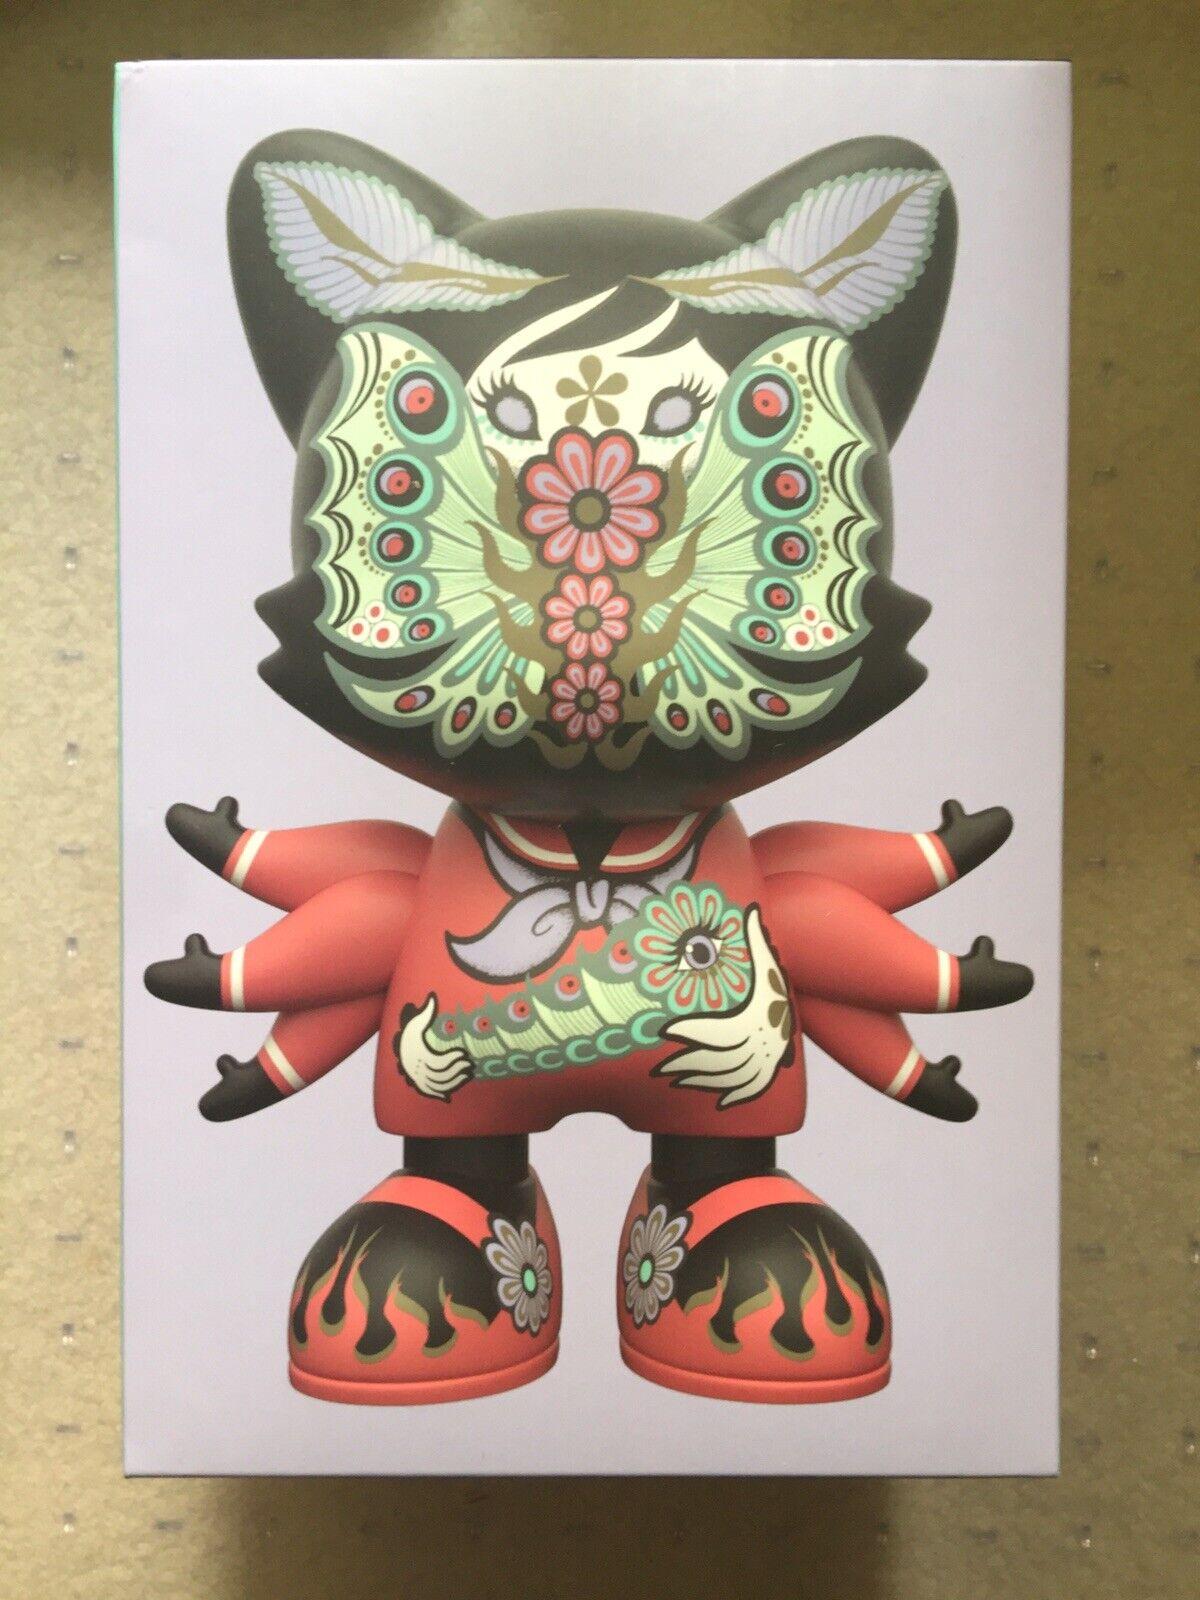 Junko Mizuno Mizuno Mizuno Lotus SUPERJANKY superplastic janky 8  x 300 art figure IN HAND f9cd6d